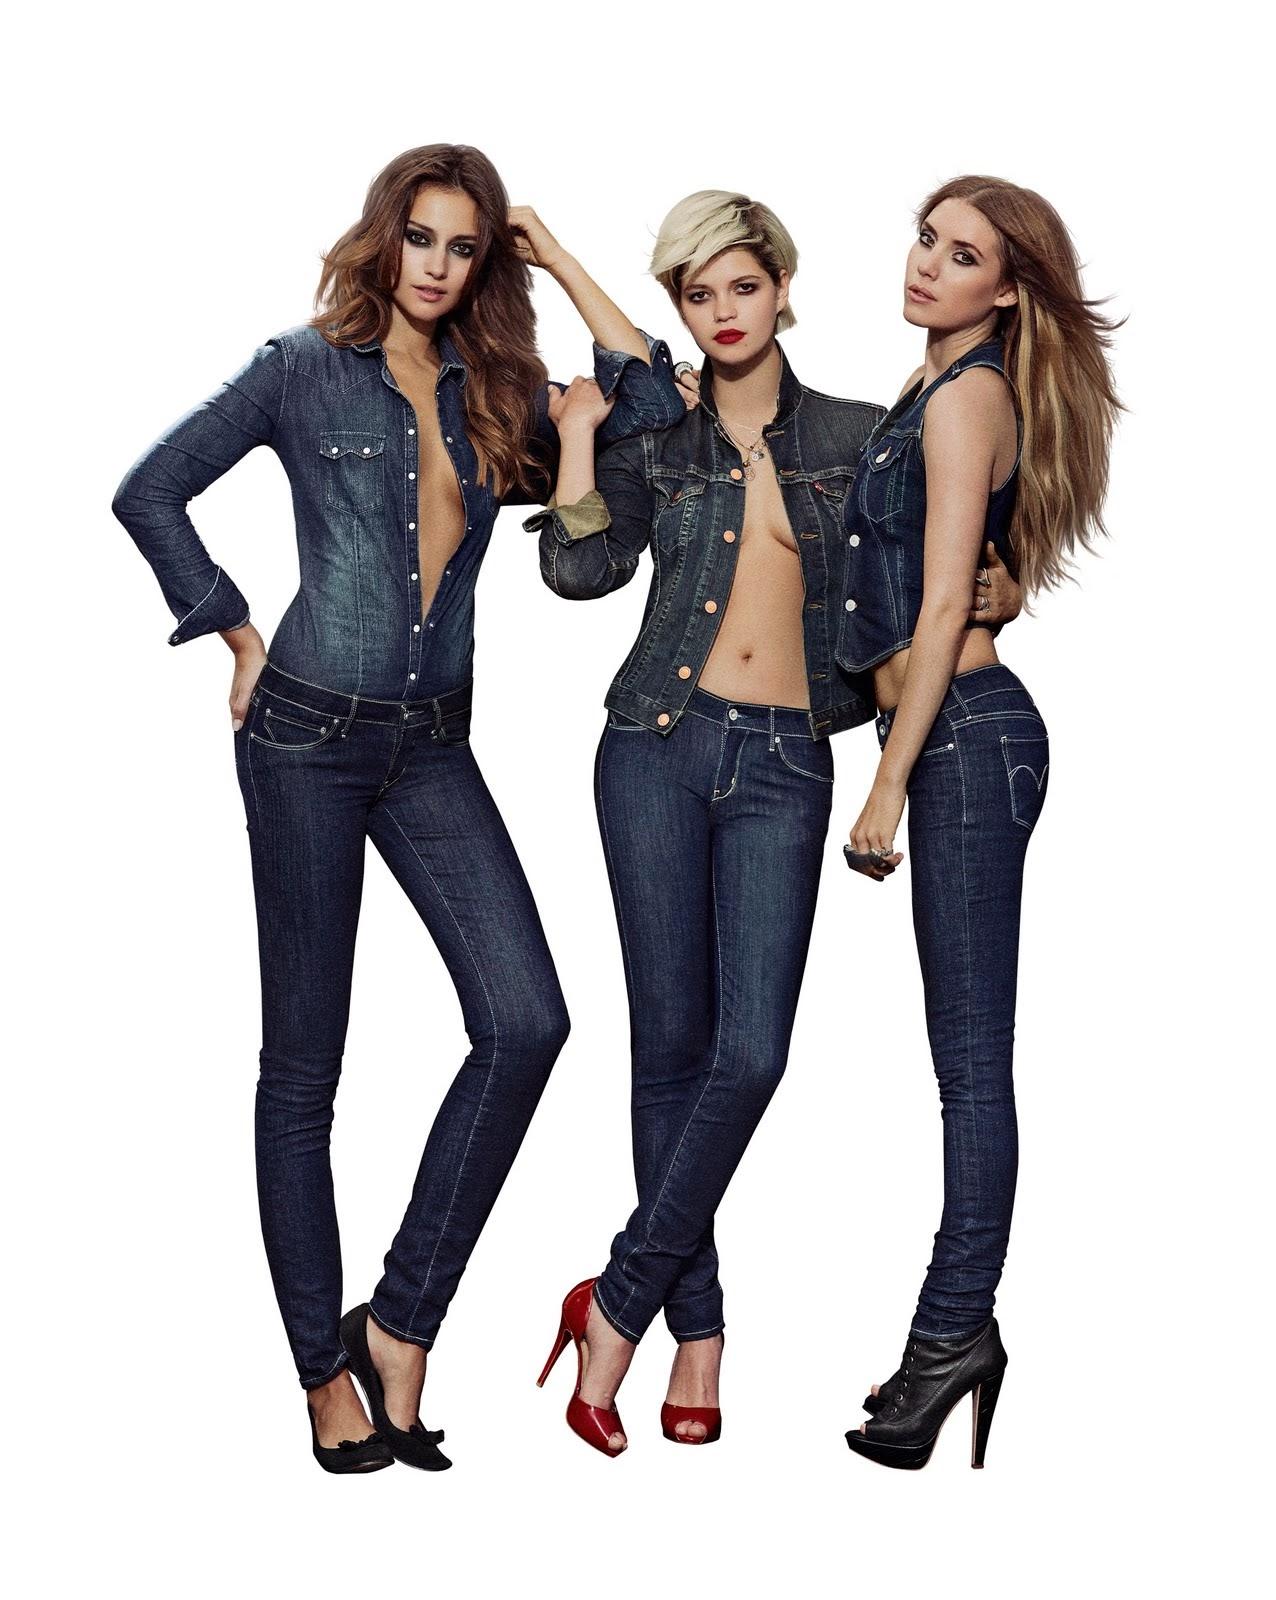 Womens Skinny Jeans Fashion Women's Fashion Jeans